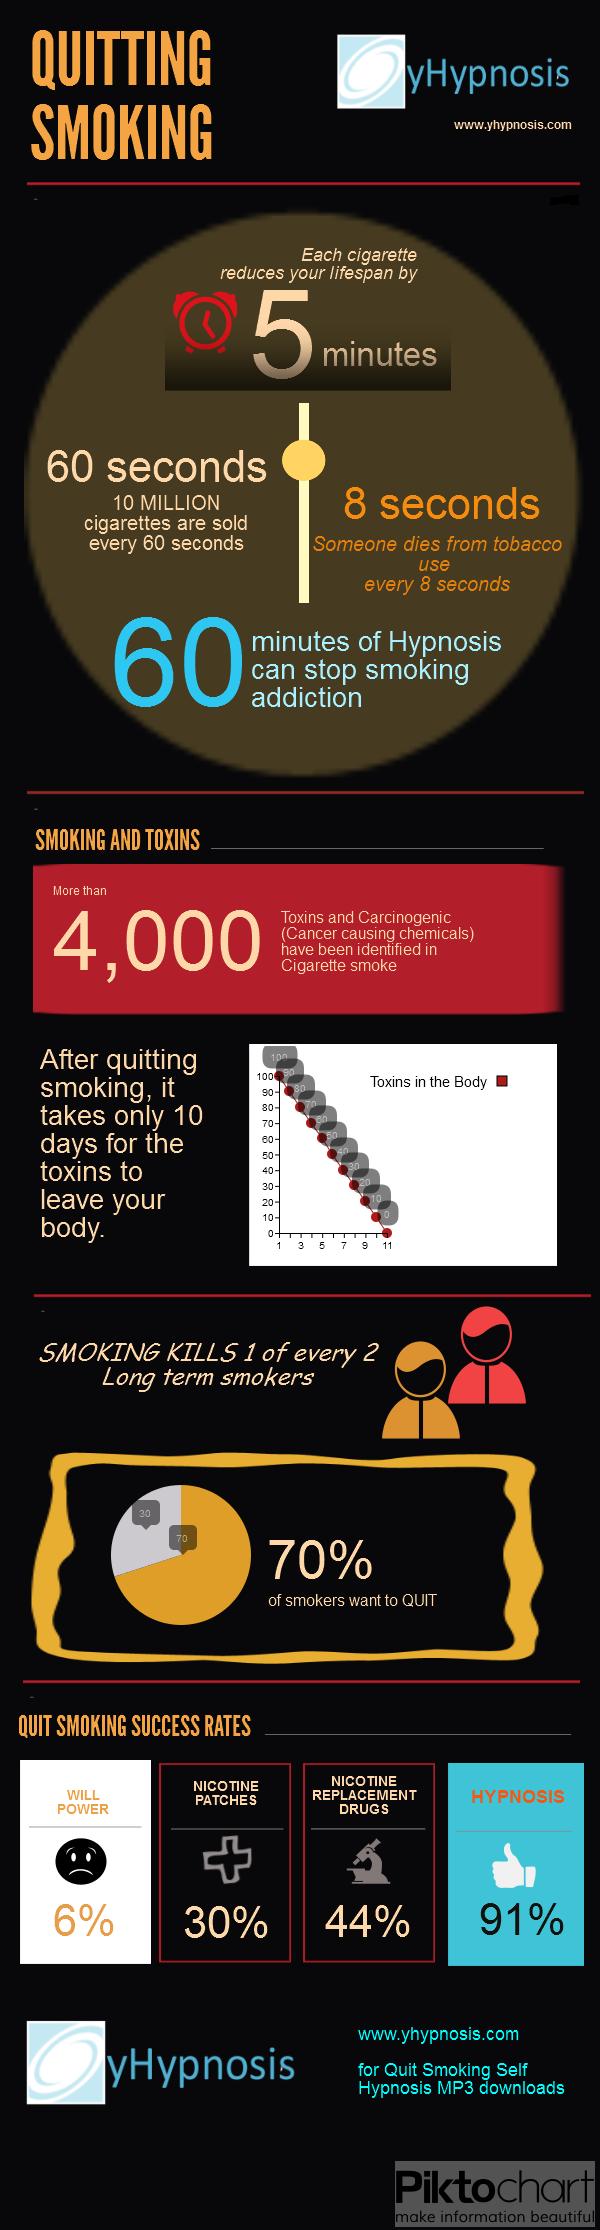 Quitting Smoking Infographic